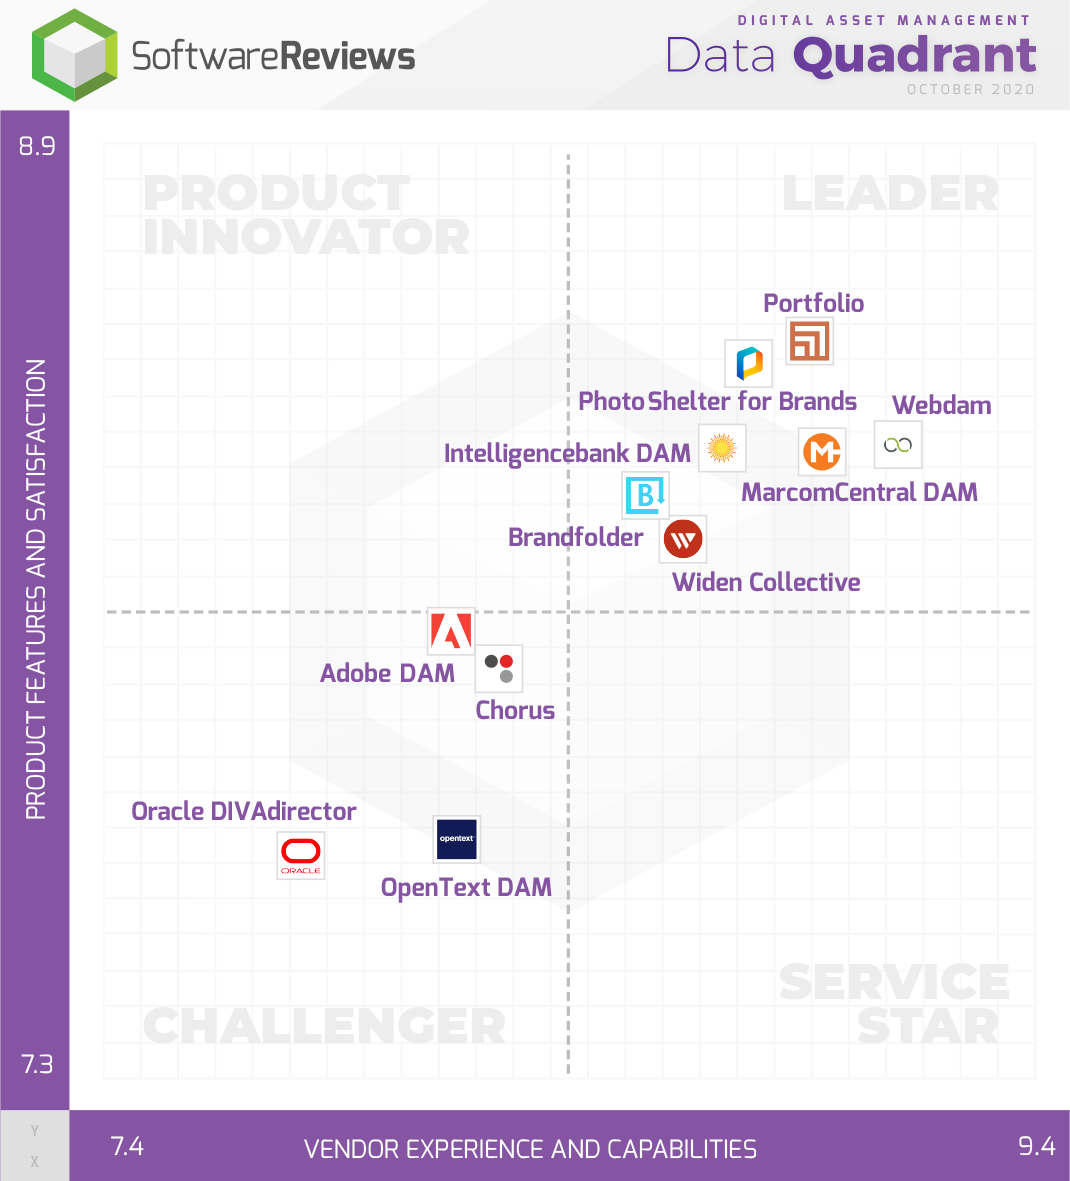 Digital Asset Management Data Quadrant